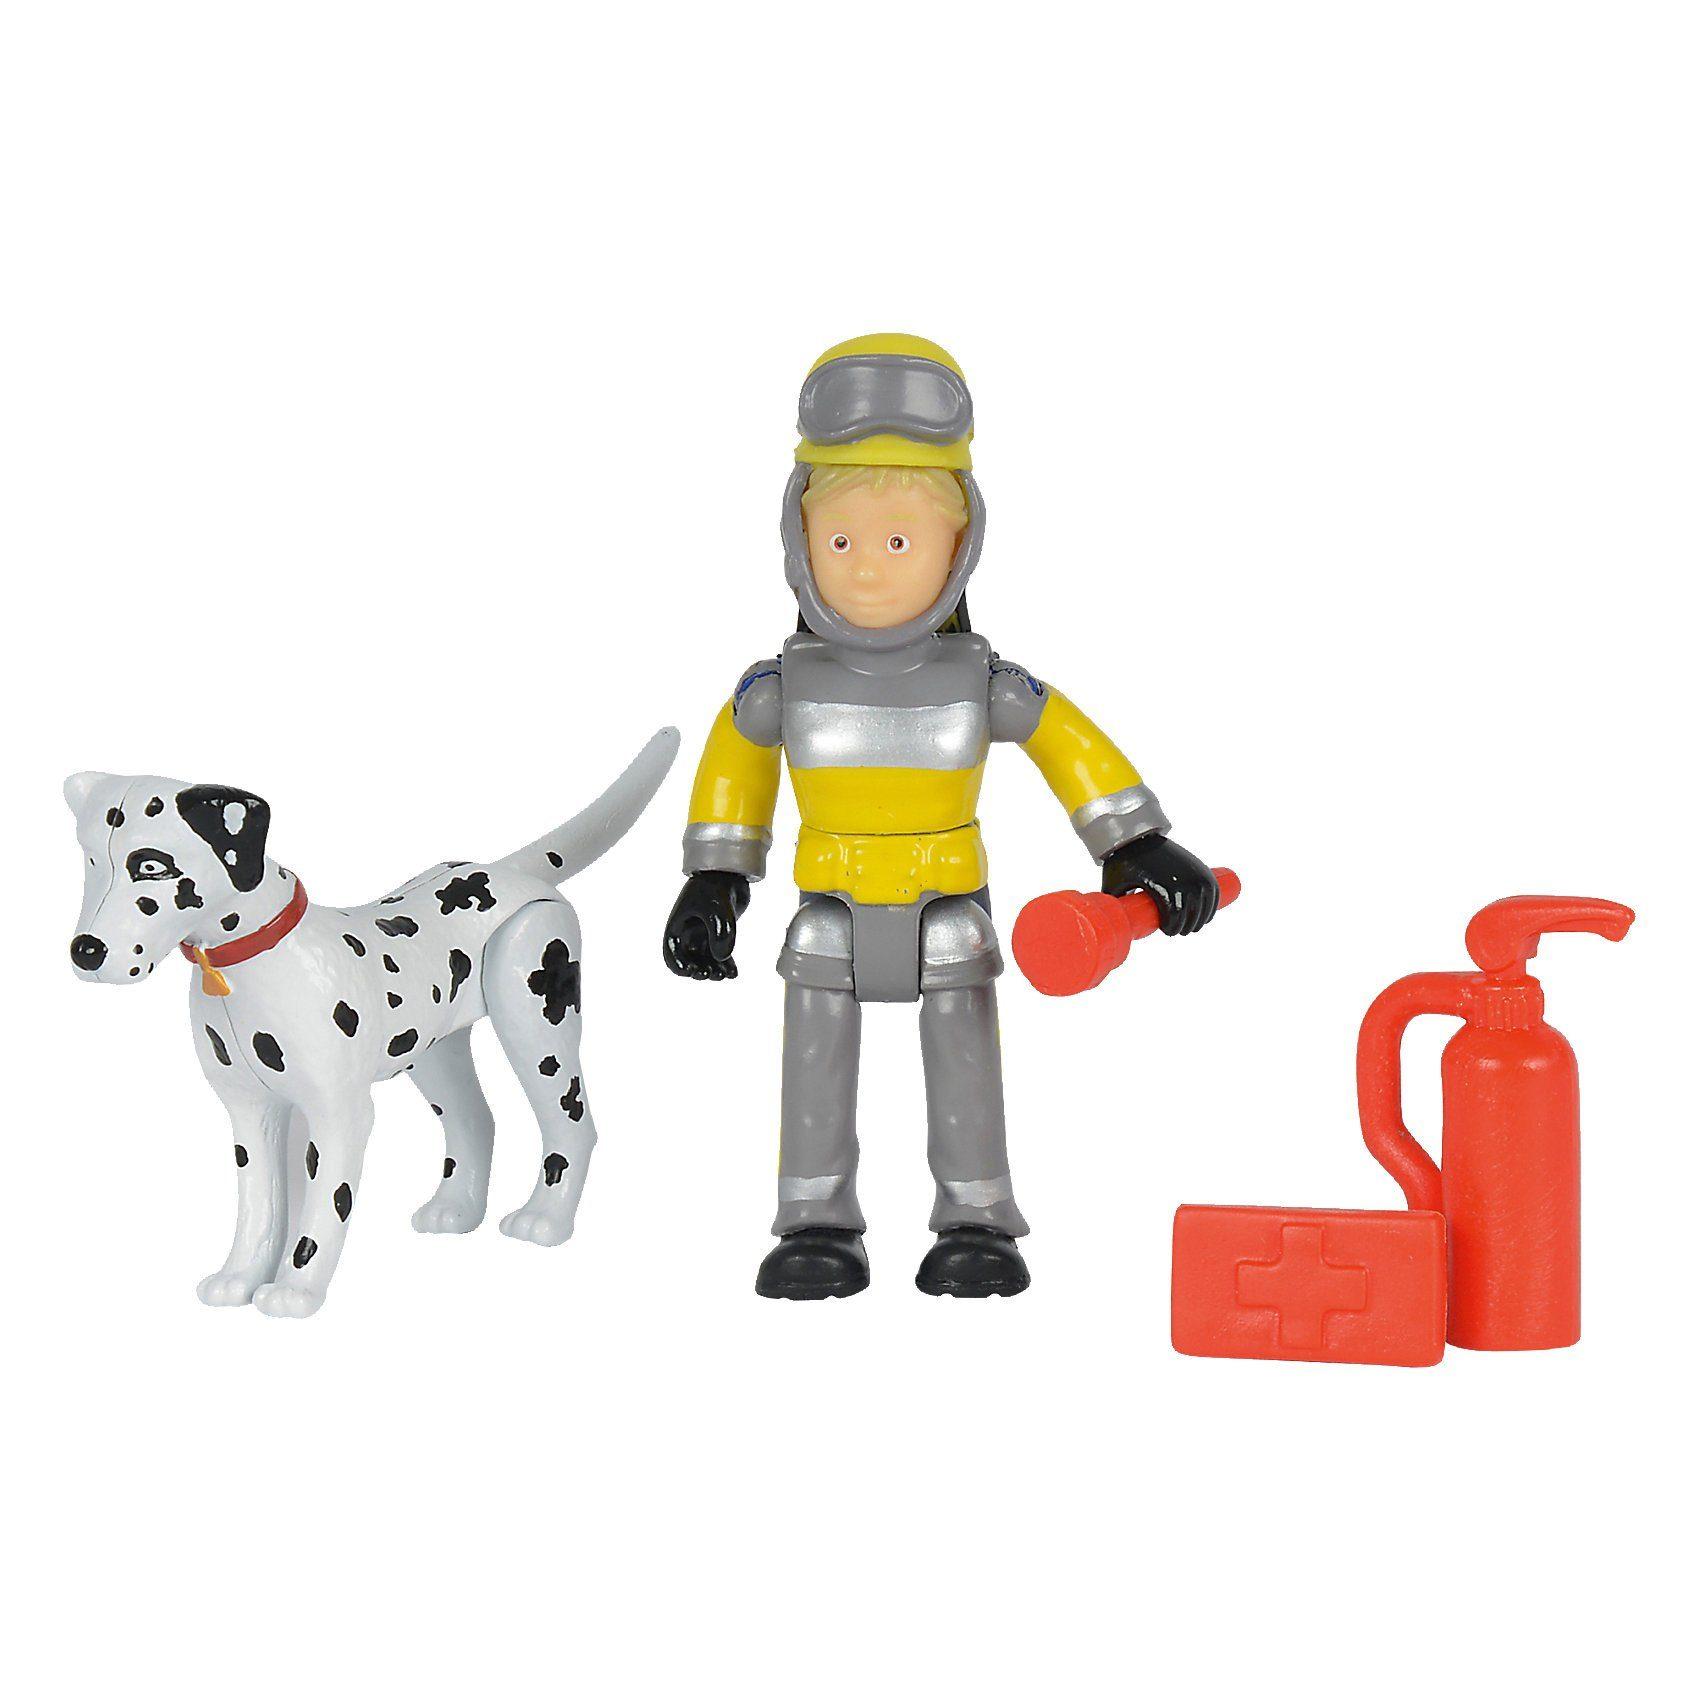 Simba Feuerwehrmann Sam - Tierrettung Figuren Set Penny + Schnuffi